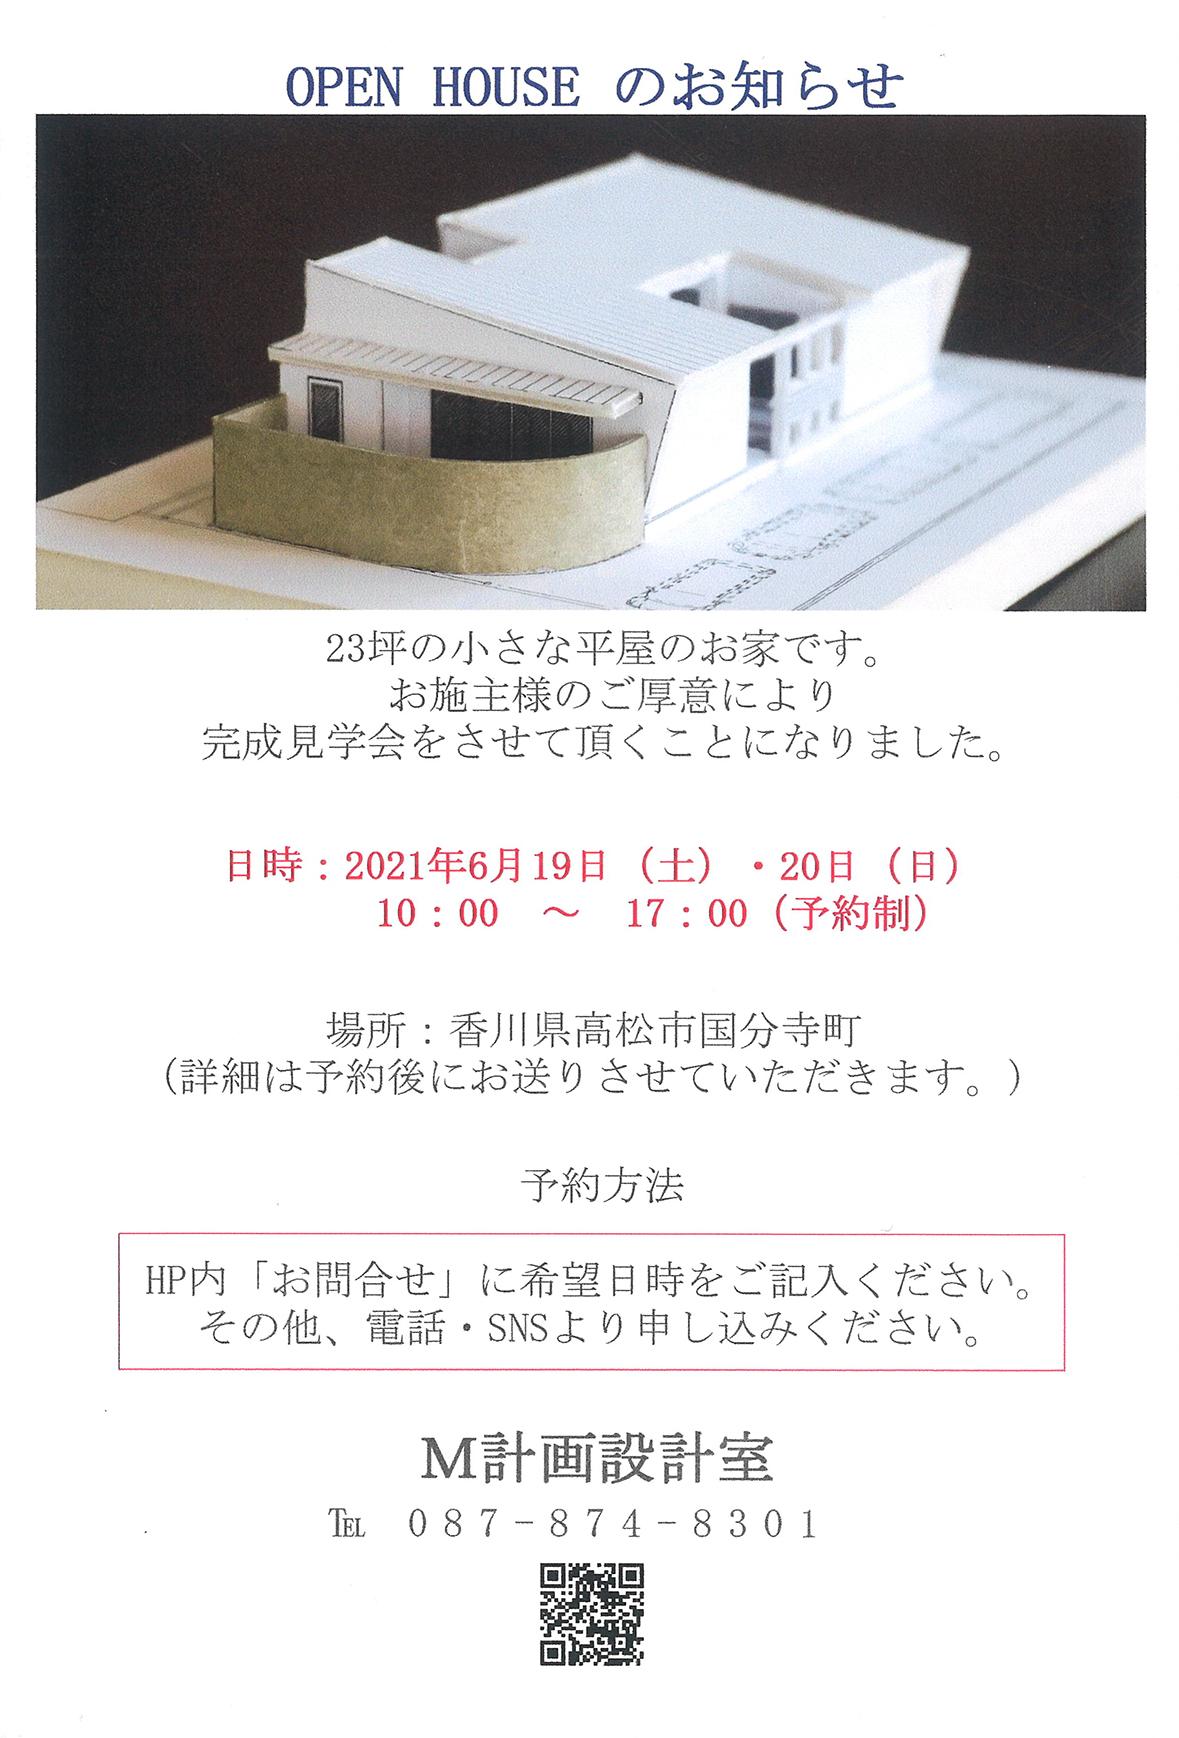 M計画-OPEN HOUSE